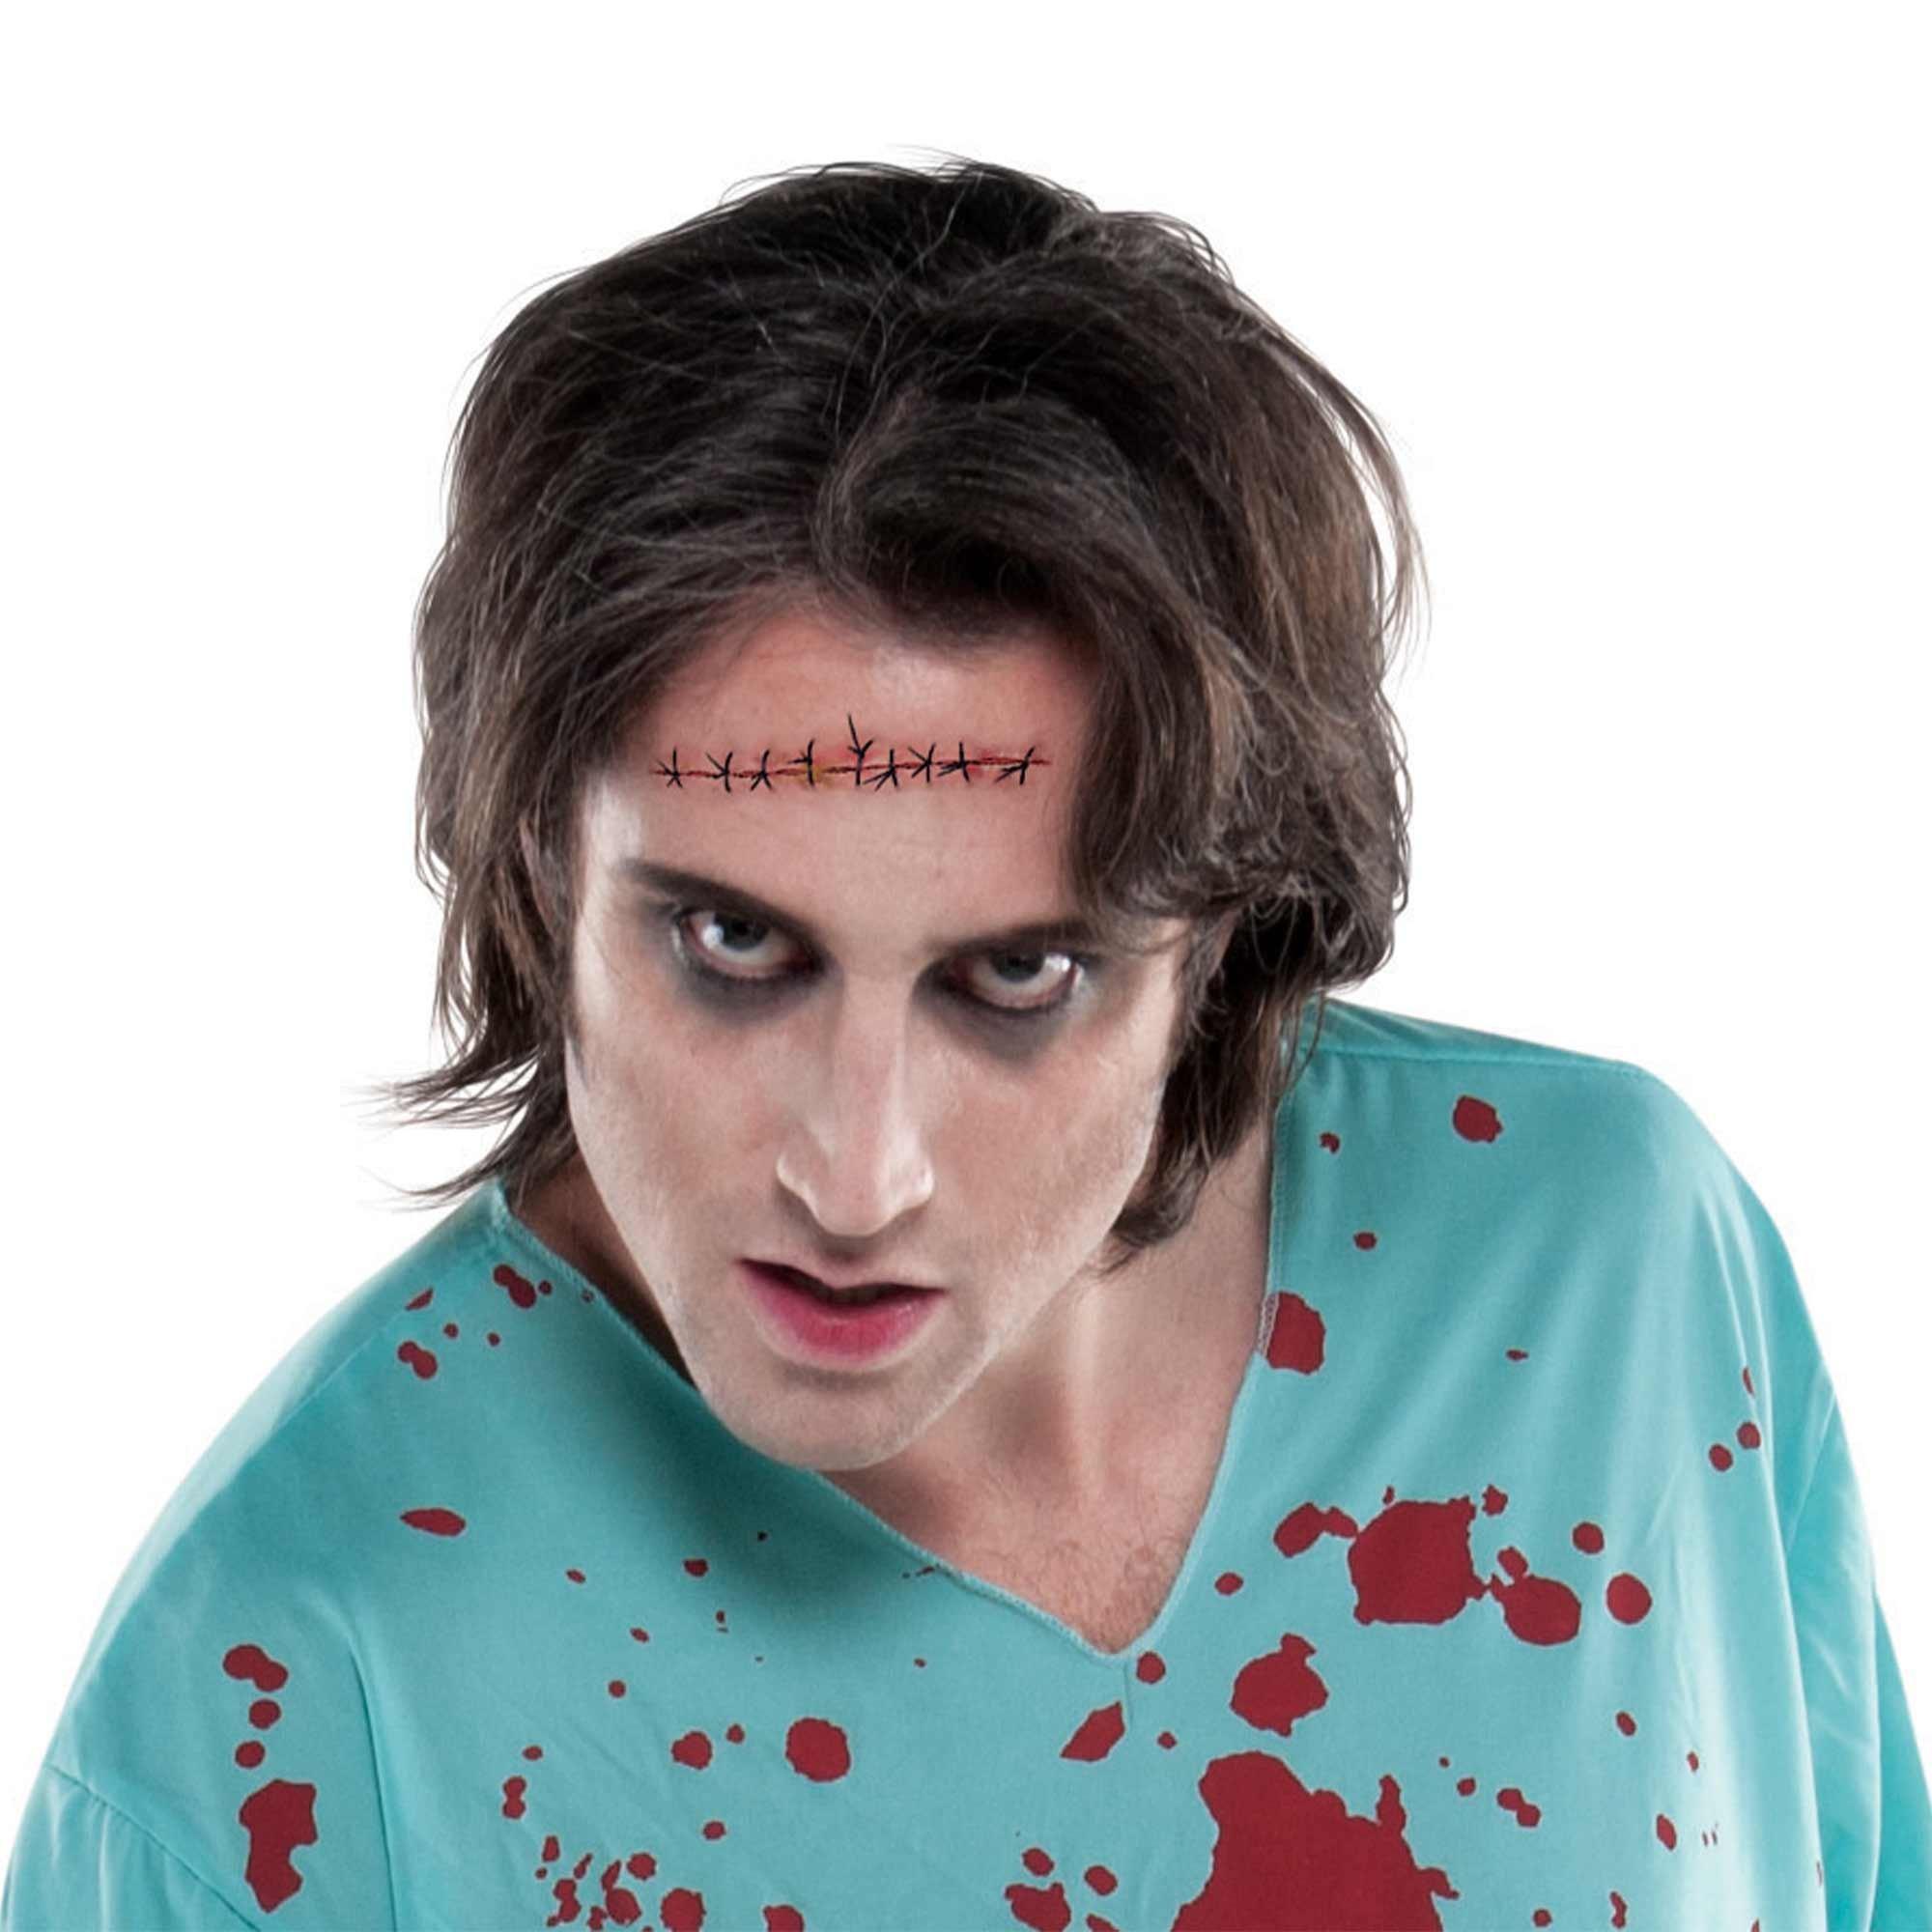 Stitches Tattoos